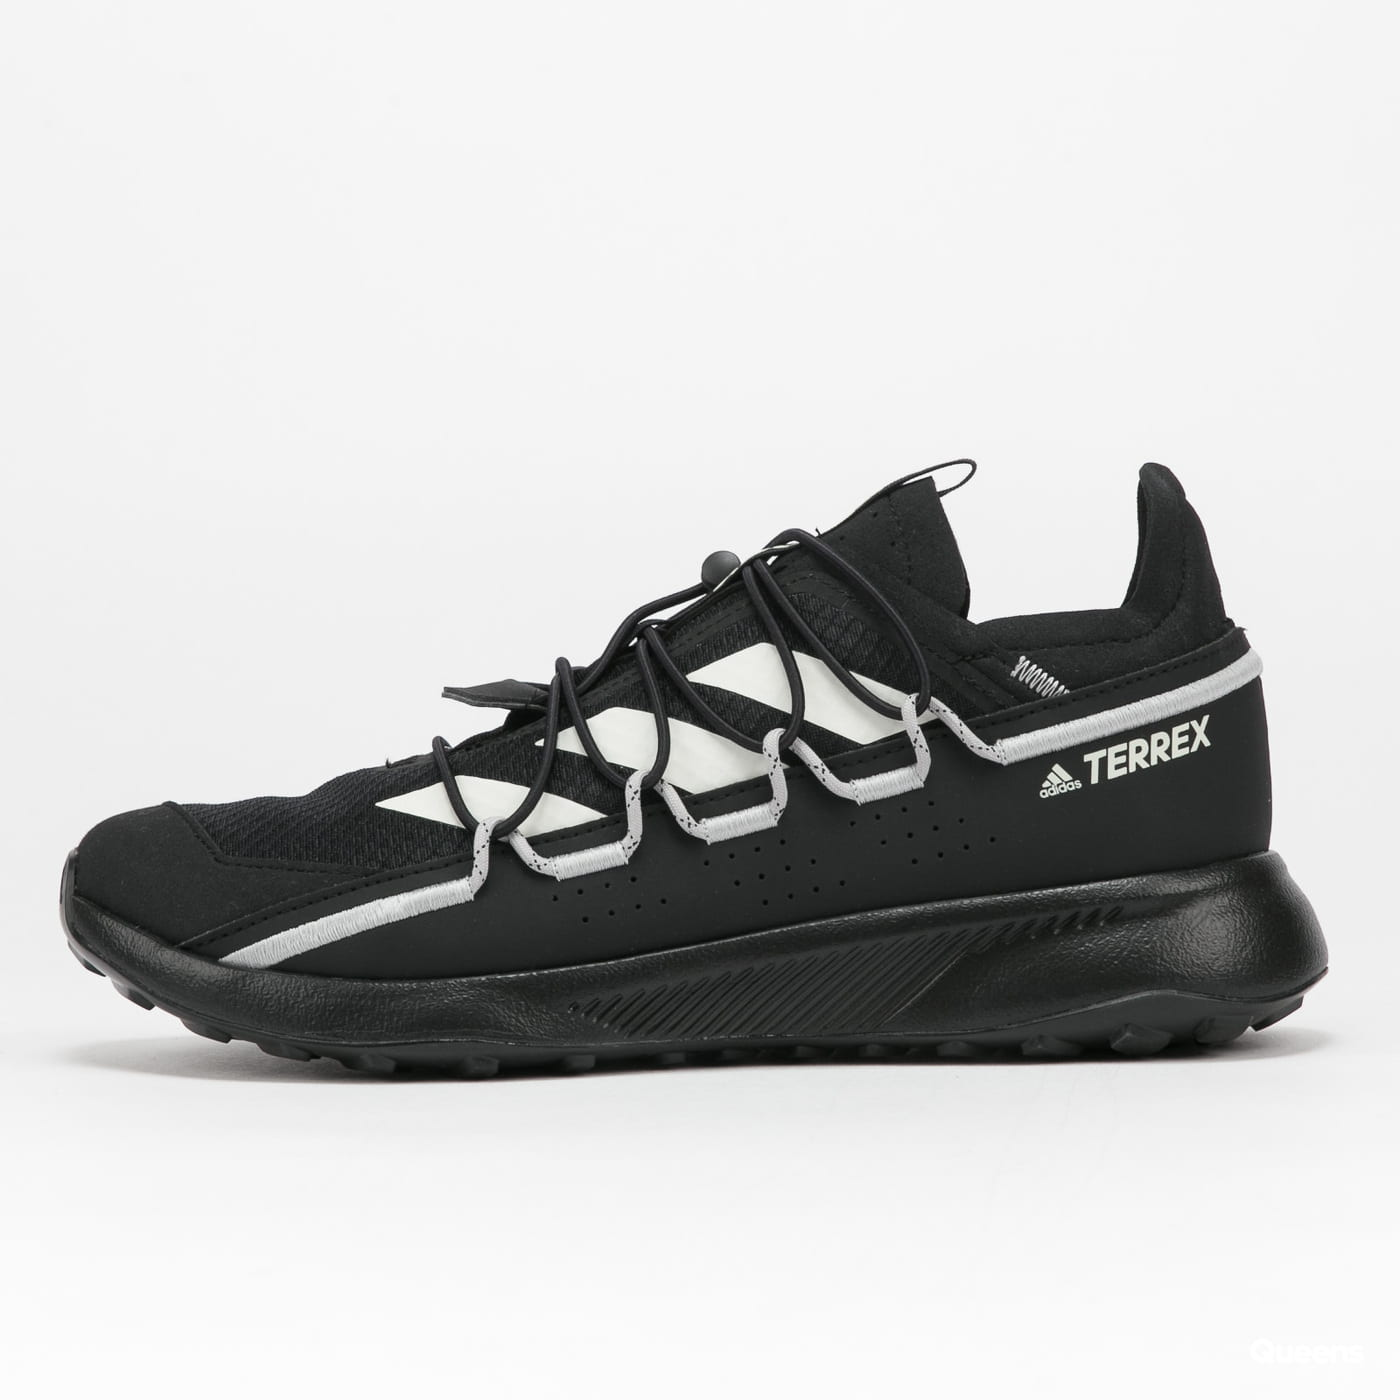 adidas Performance Terrex Voyager 21 cblack / cwhite / gretwo